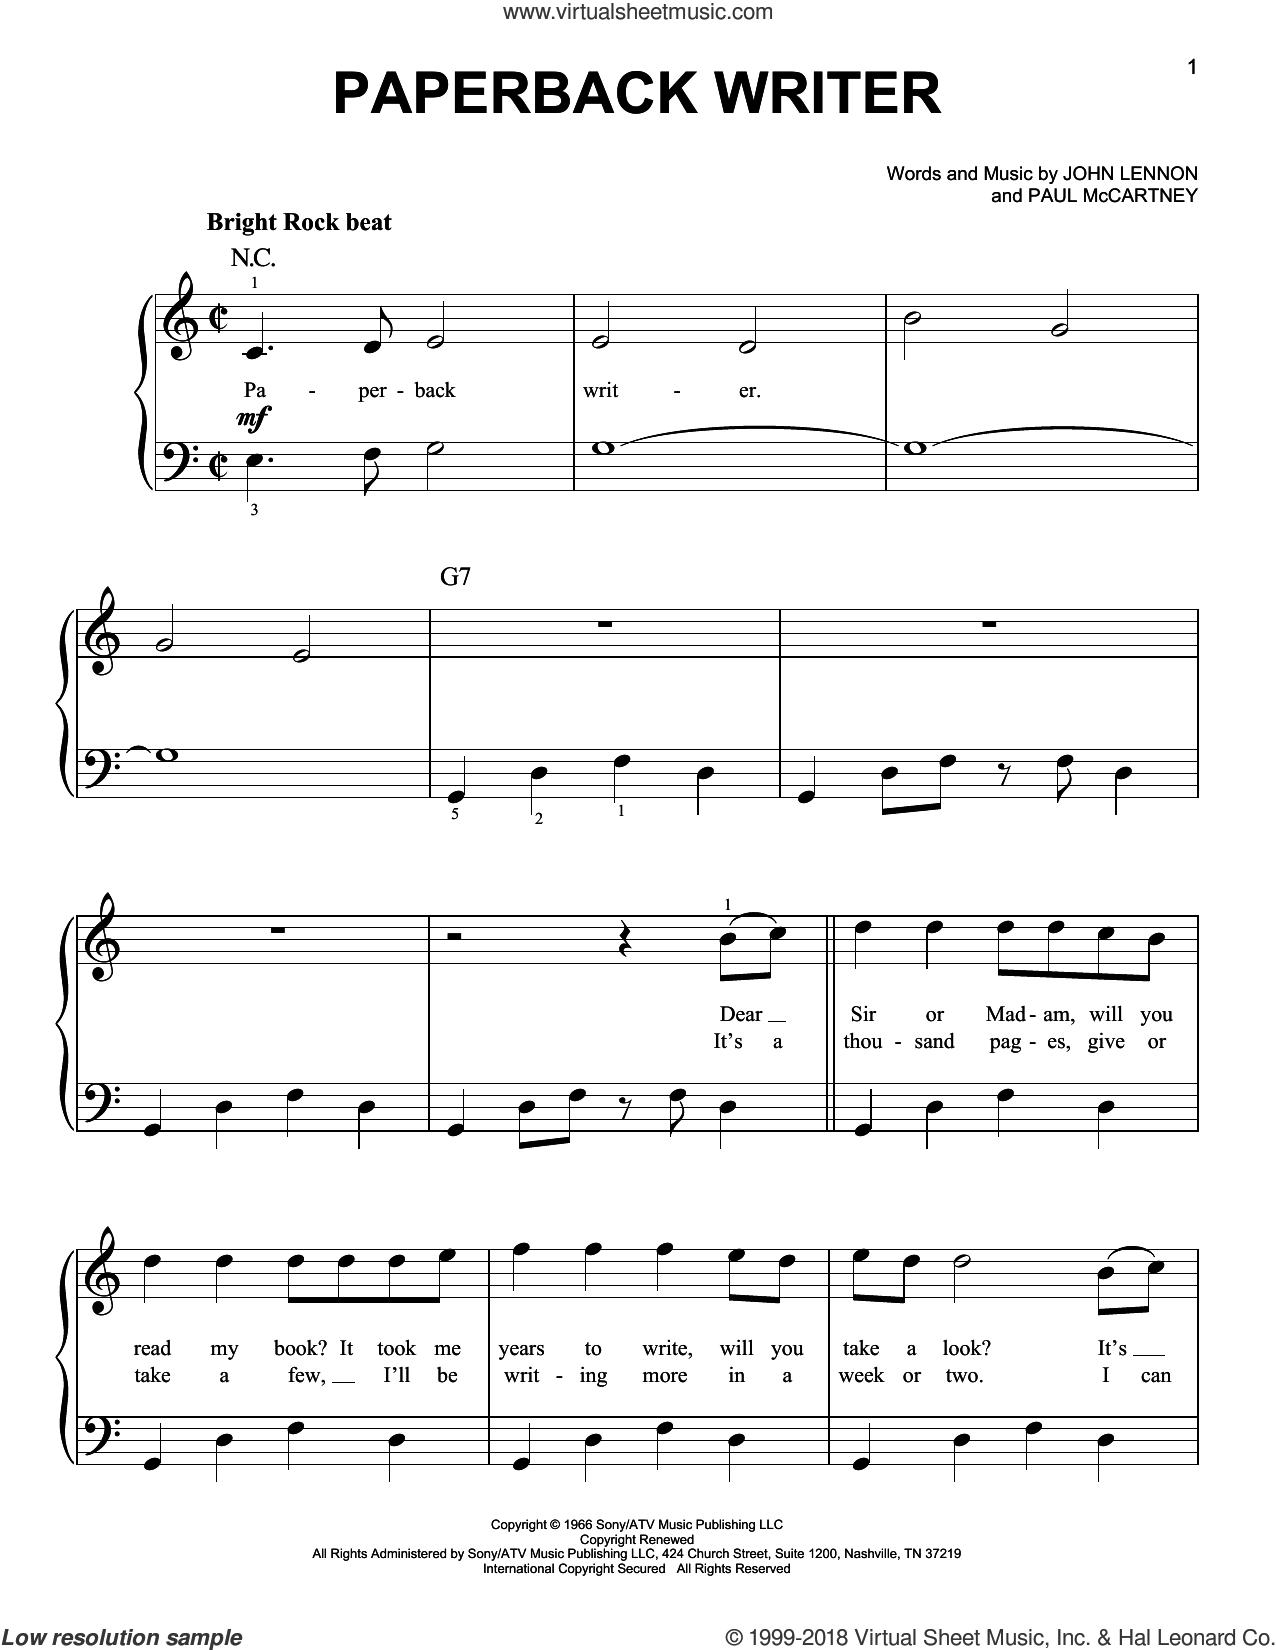 Paperback Writer sheet music for piano solo by The Beatles, John Lennon and Paul McCartney, beginner skill level